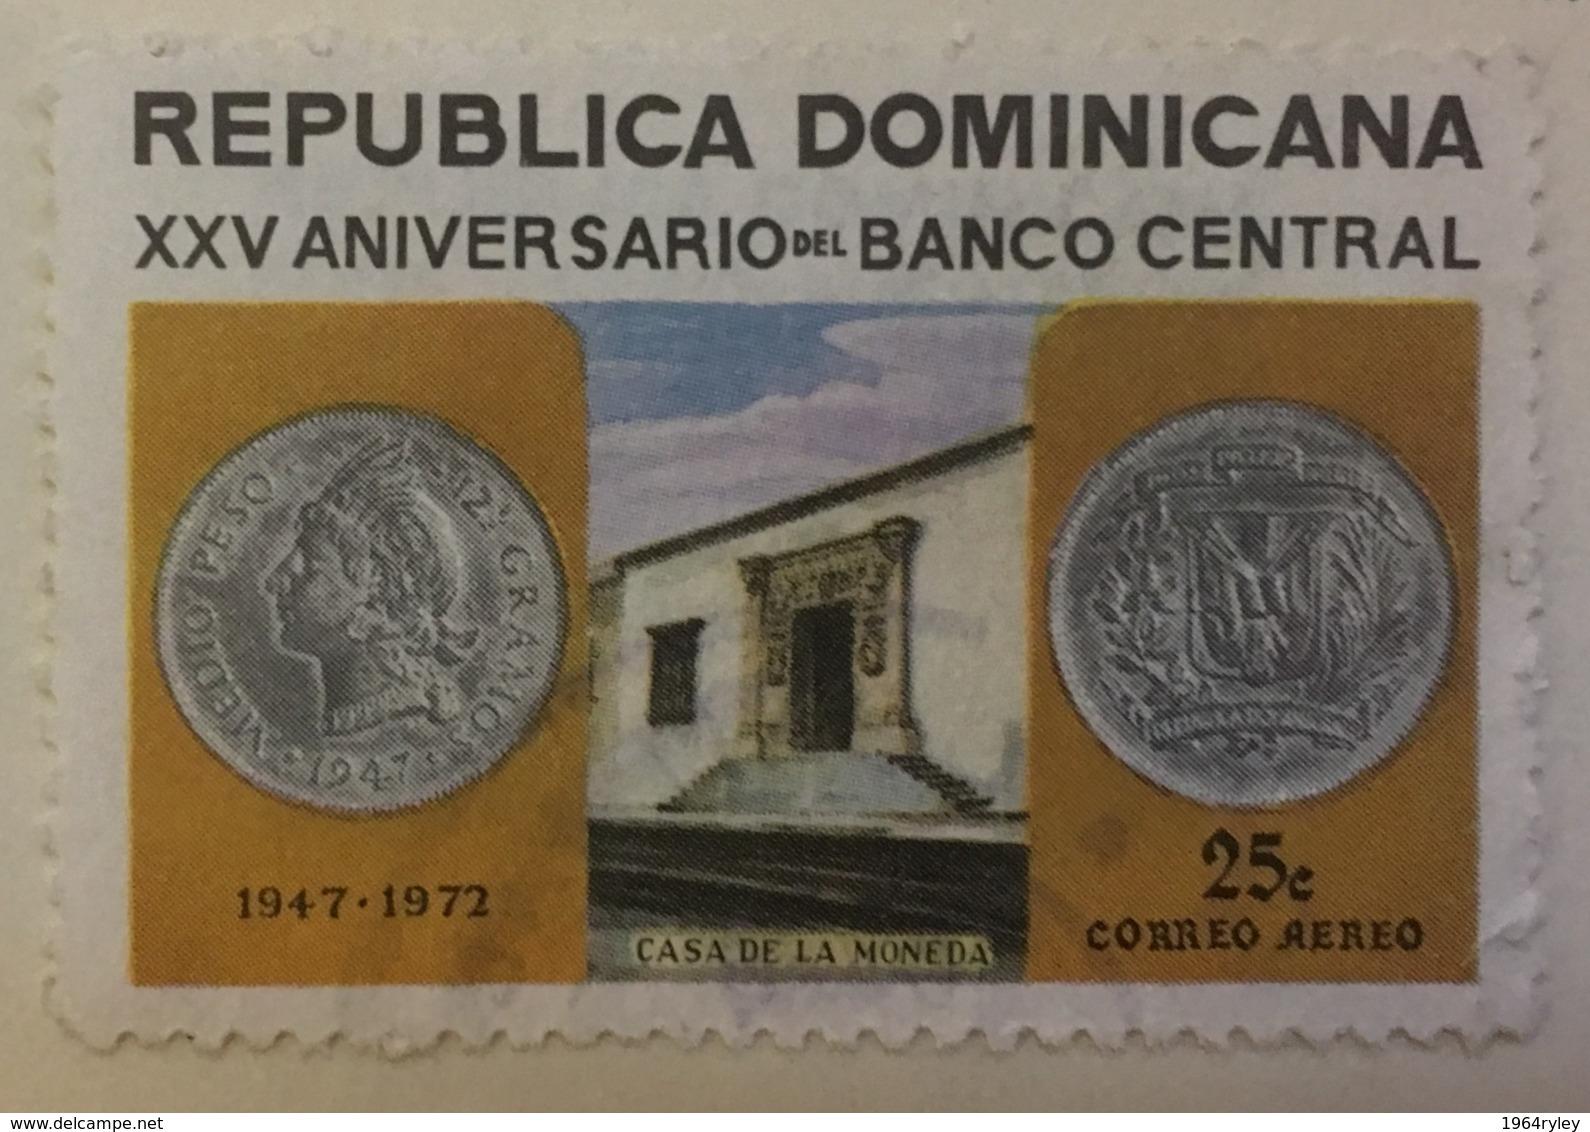 DOMINCAN REPUBLIC - (0) - 1972 - # C 202 - Dominican Republic